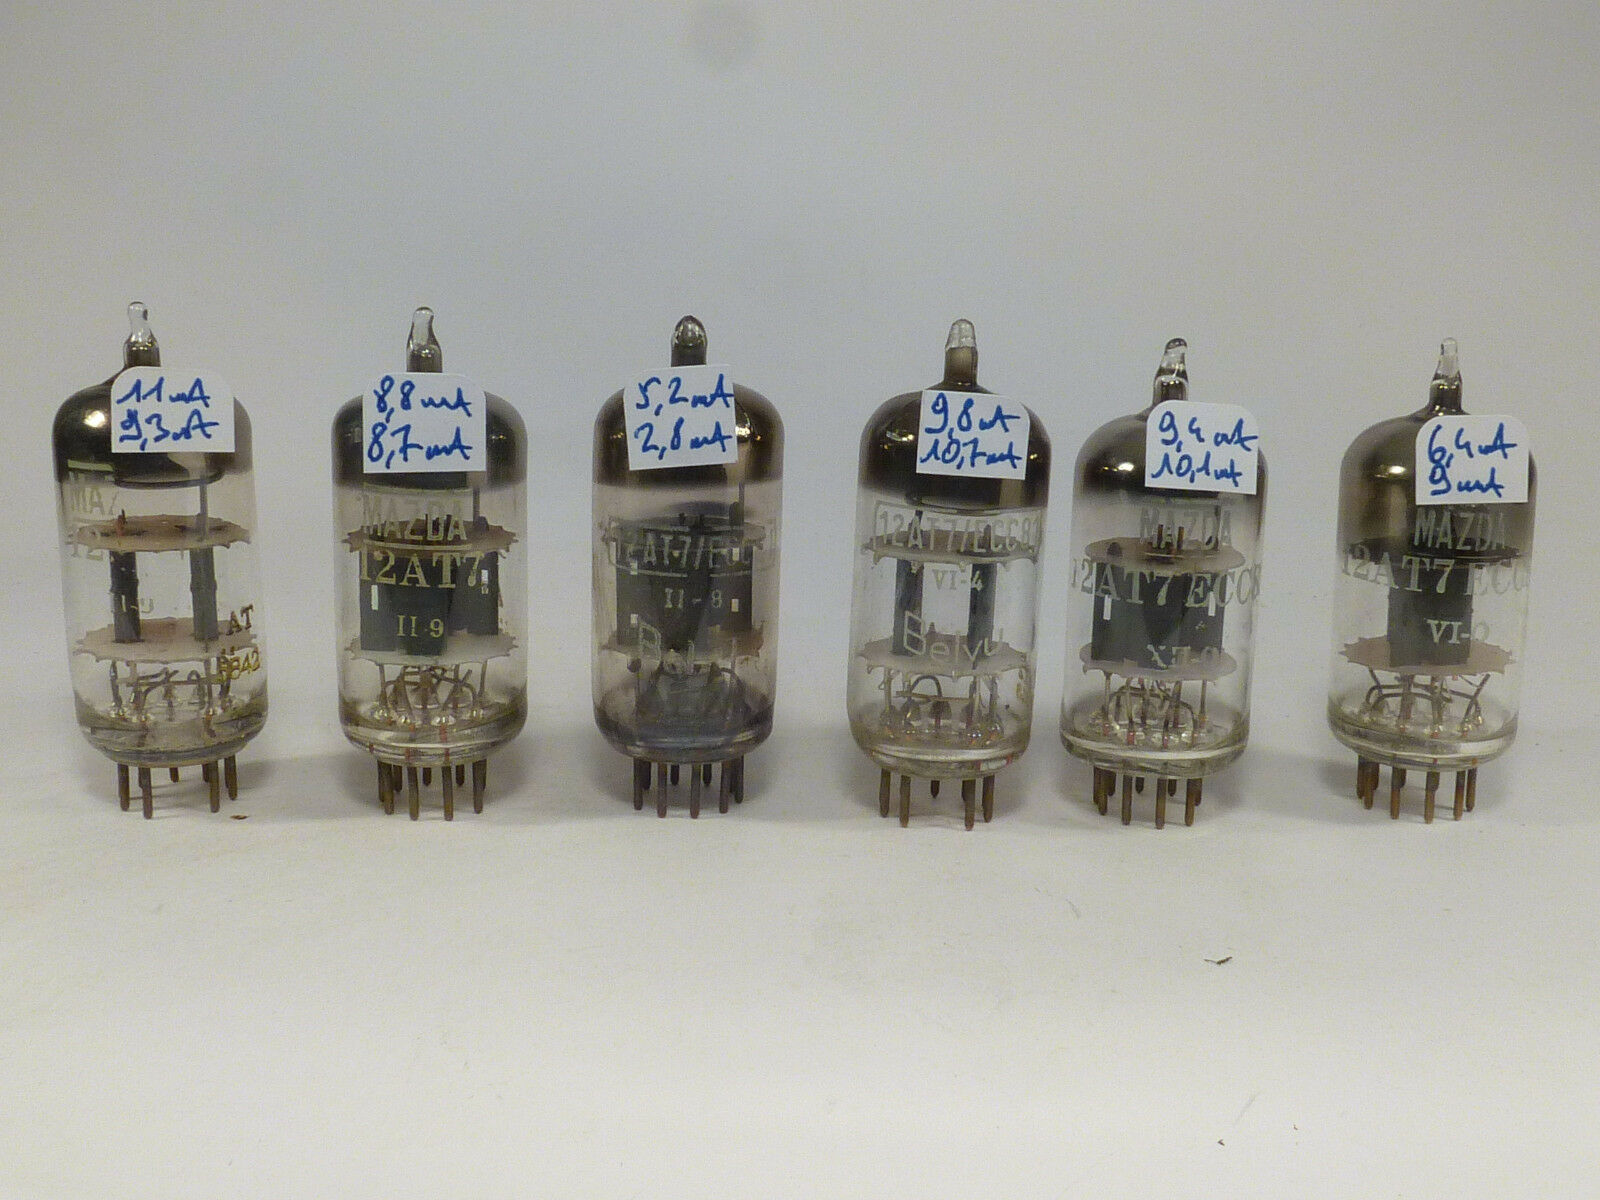 6  ECC81 12AT7 Mazda & Belvu all tested near NOS, for guitare amplifier etc